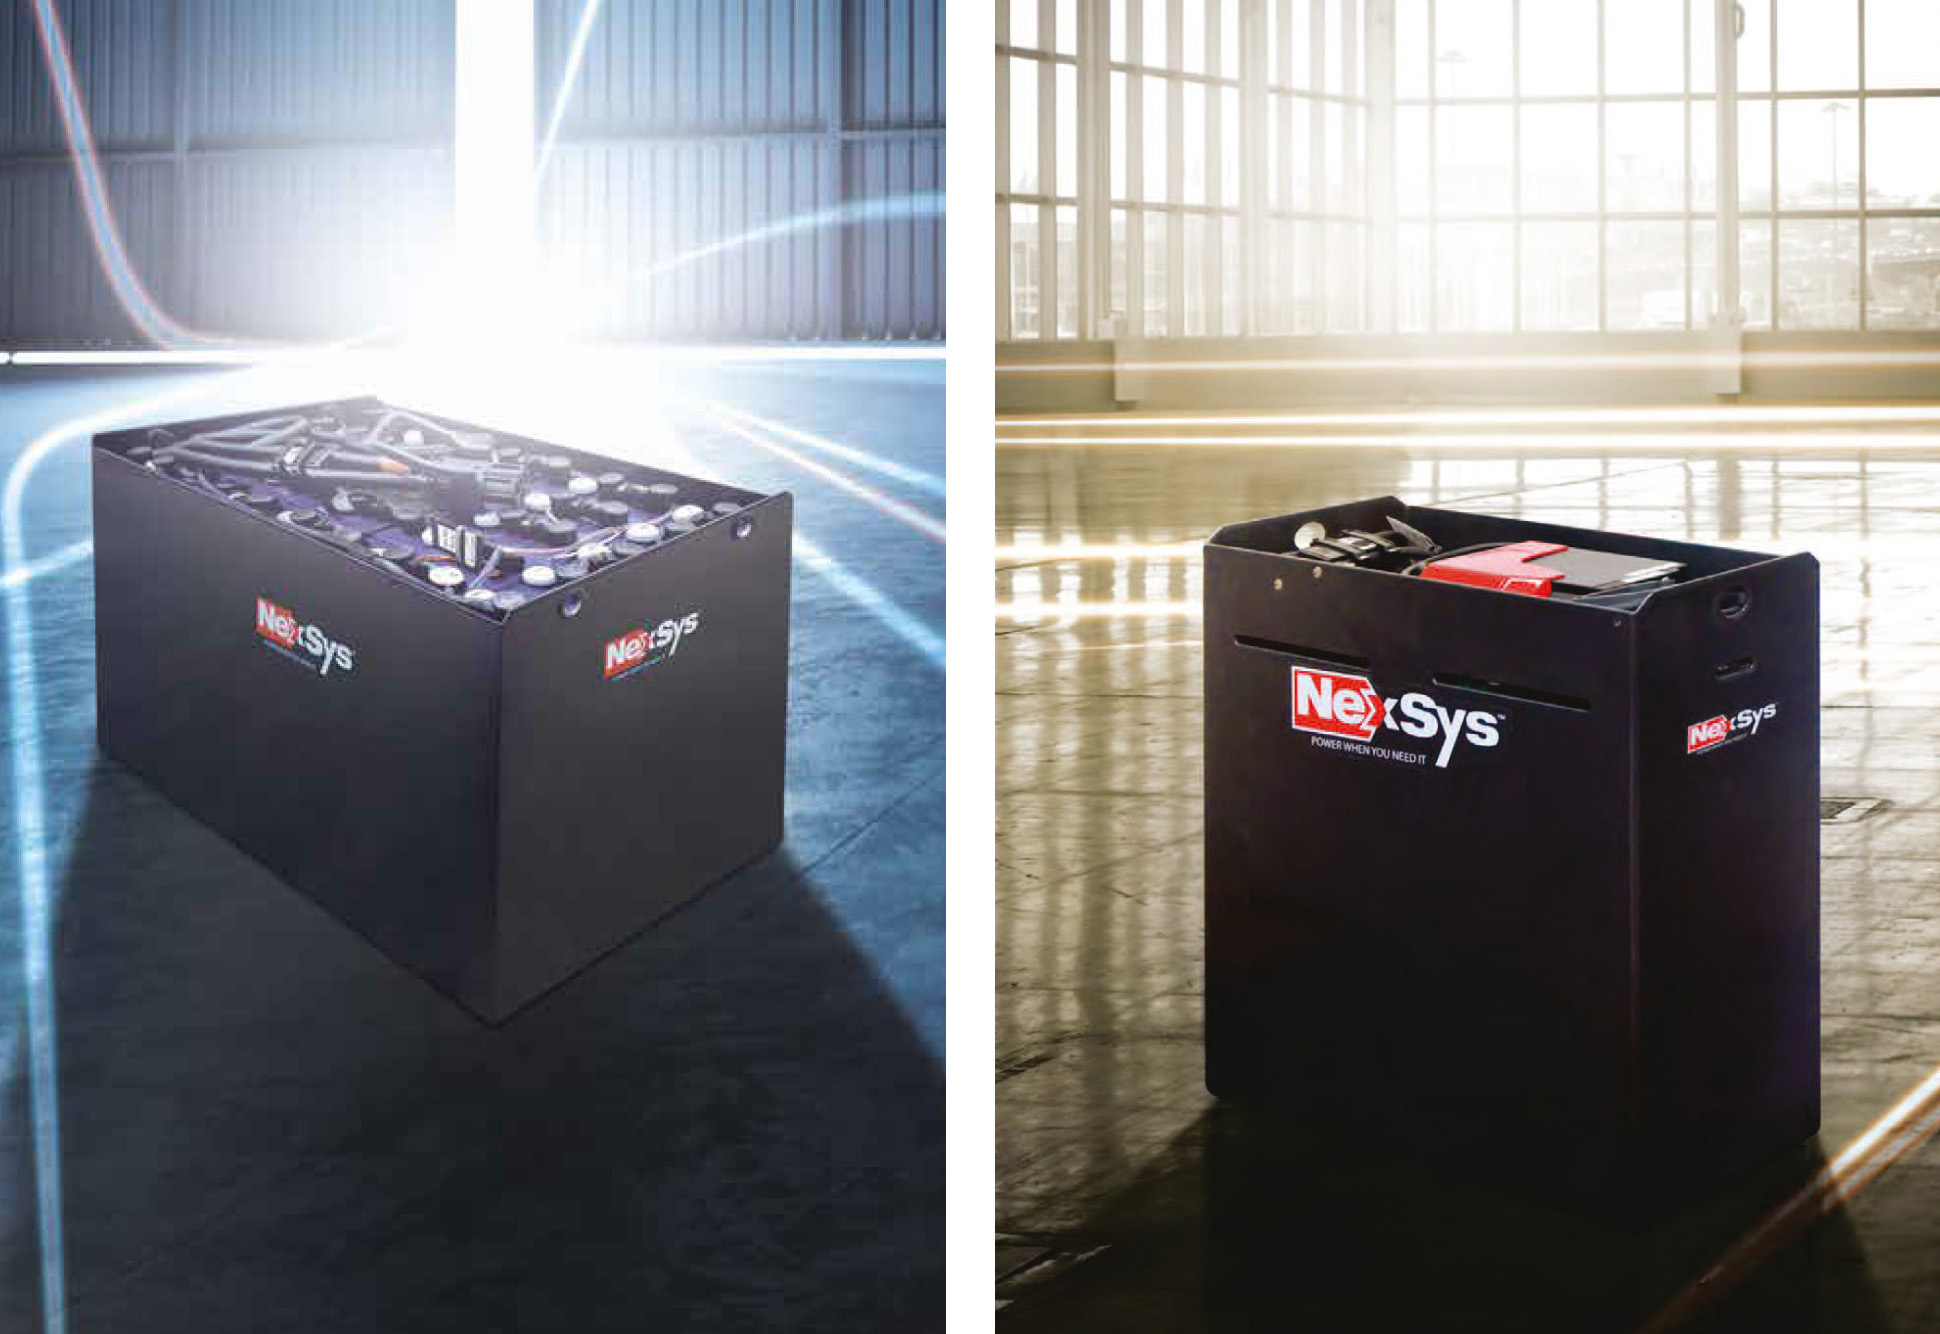 Batterie Nexsys® Tutta l'Energia quando Serve